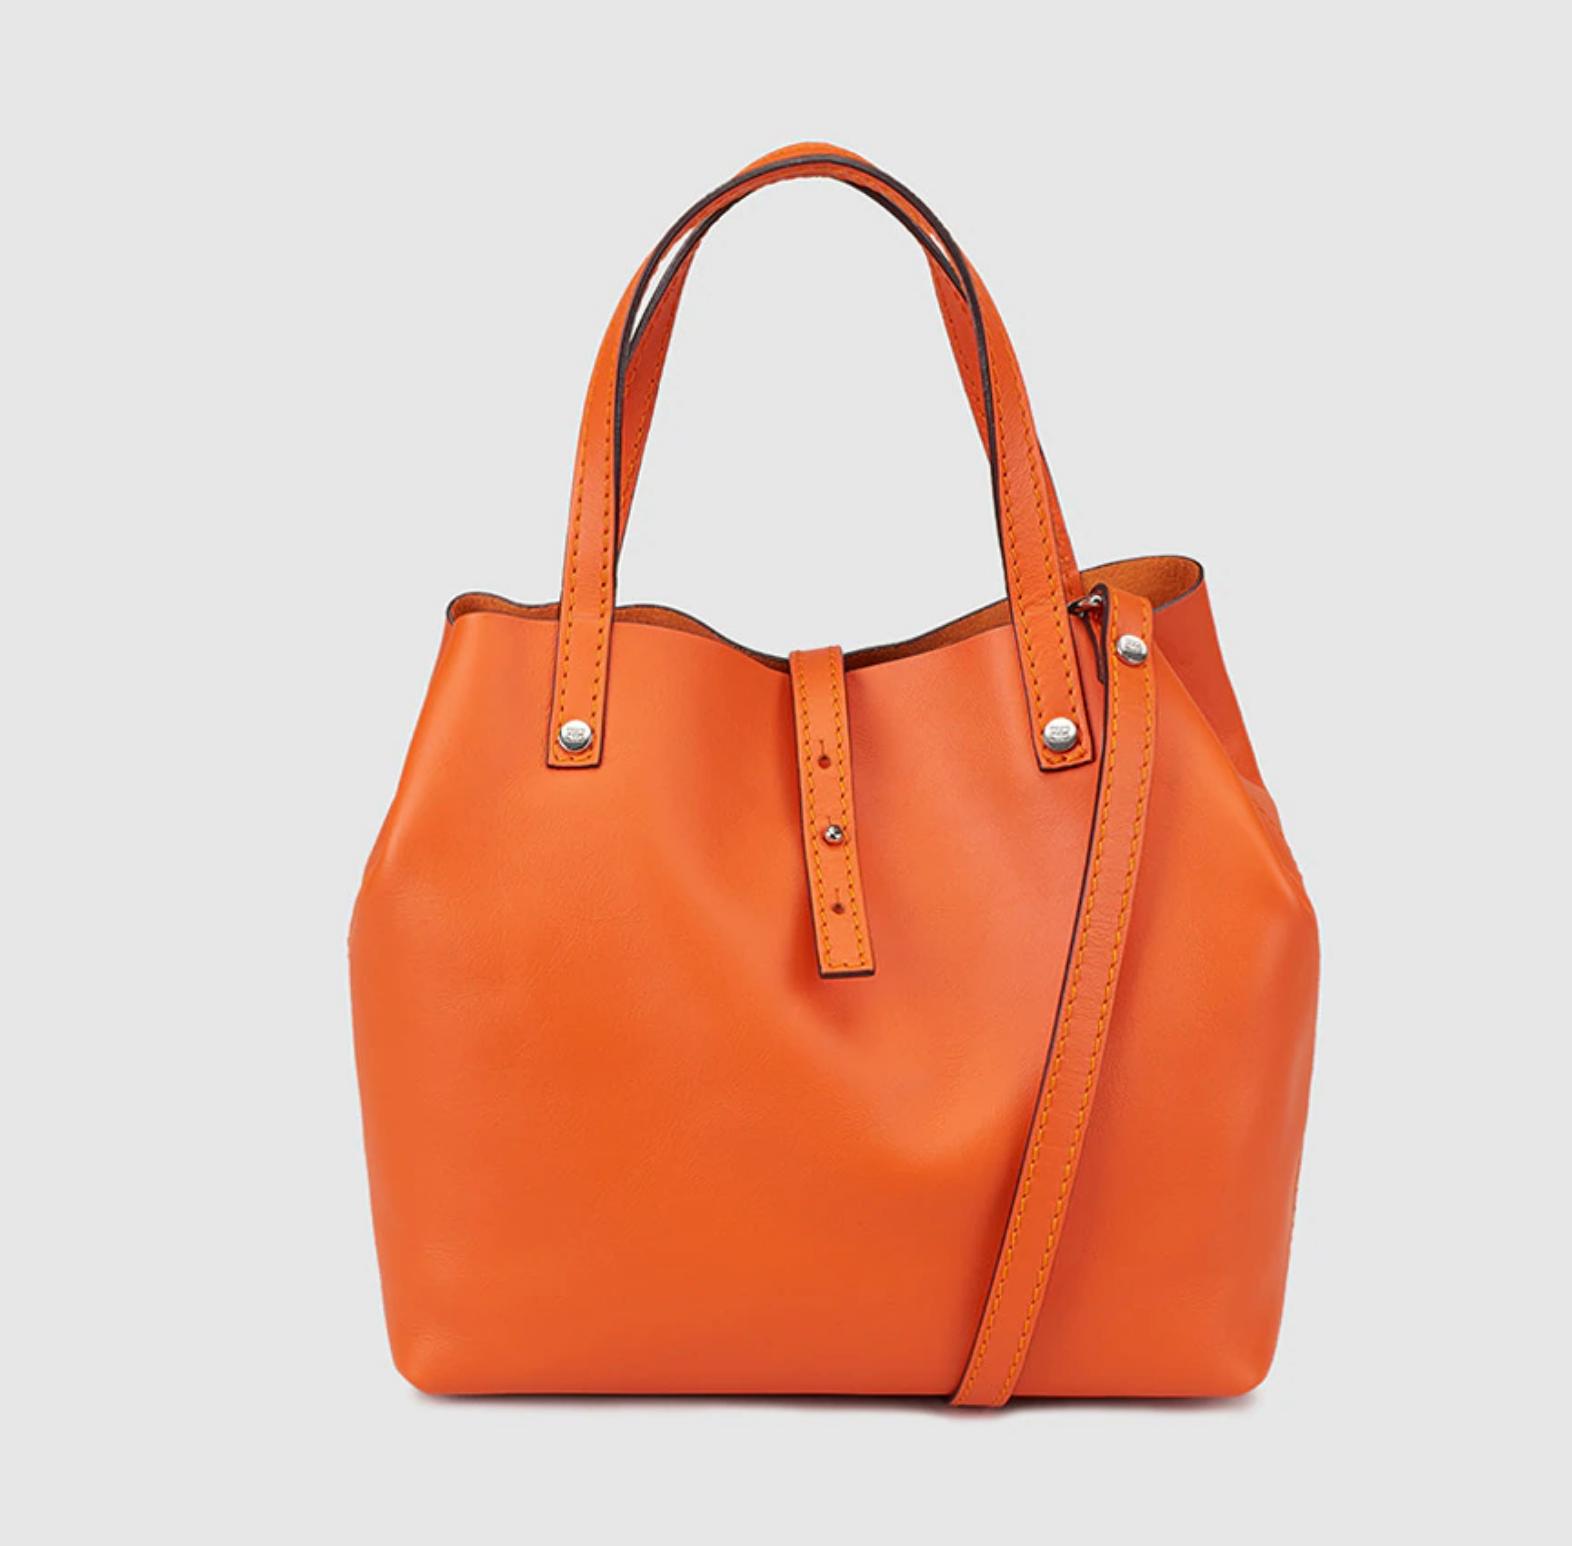 Shopping pequeño Sofia de piel en naranja